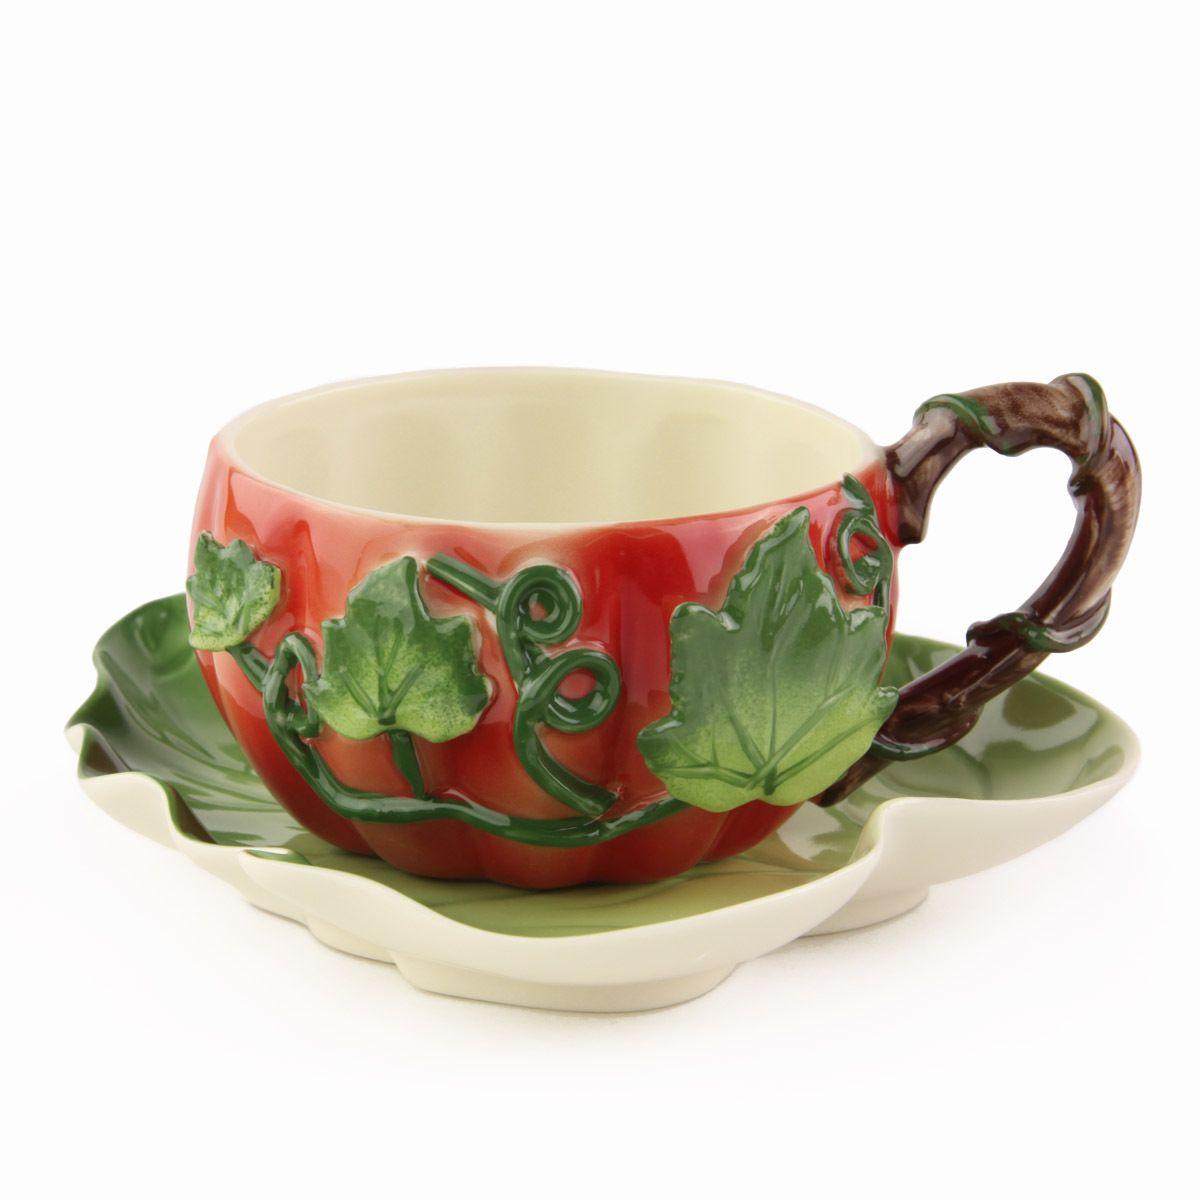 Ceramic Cups And Saucers Saucer Set Ceramic Cup And